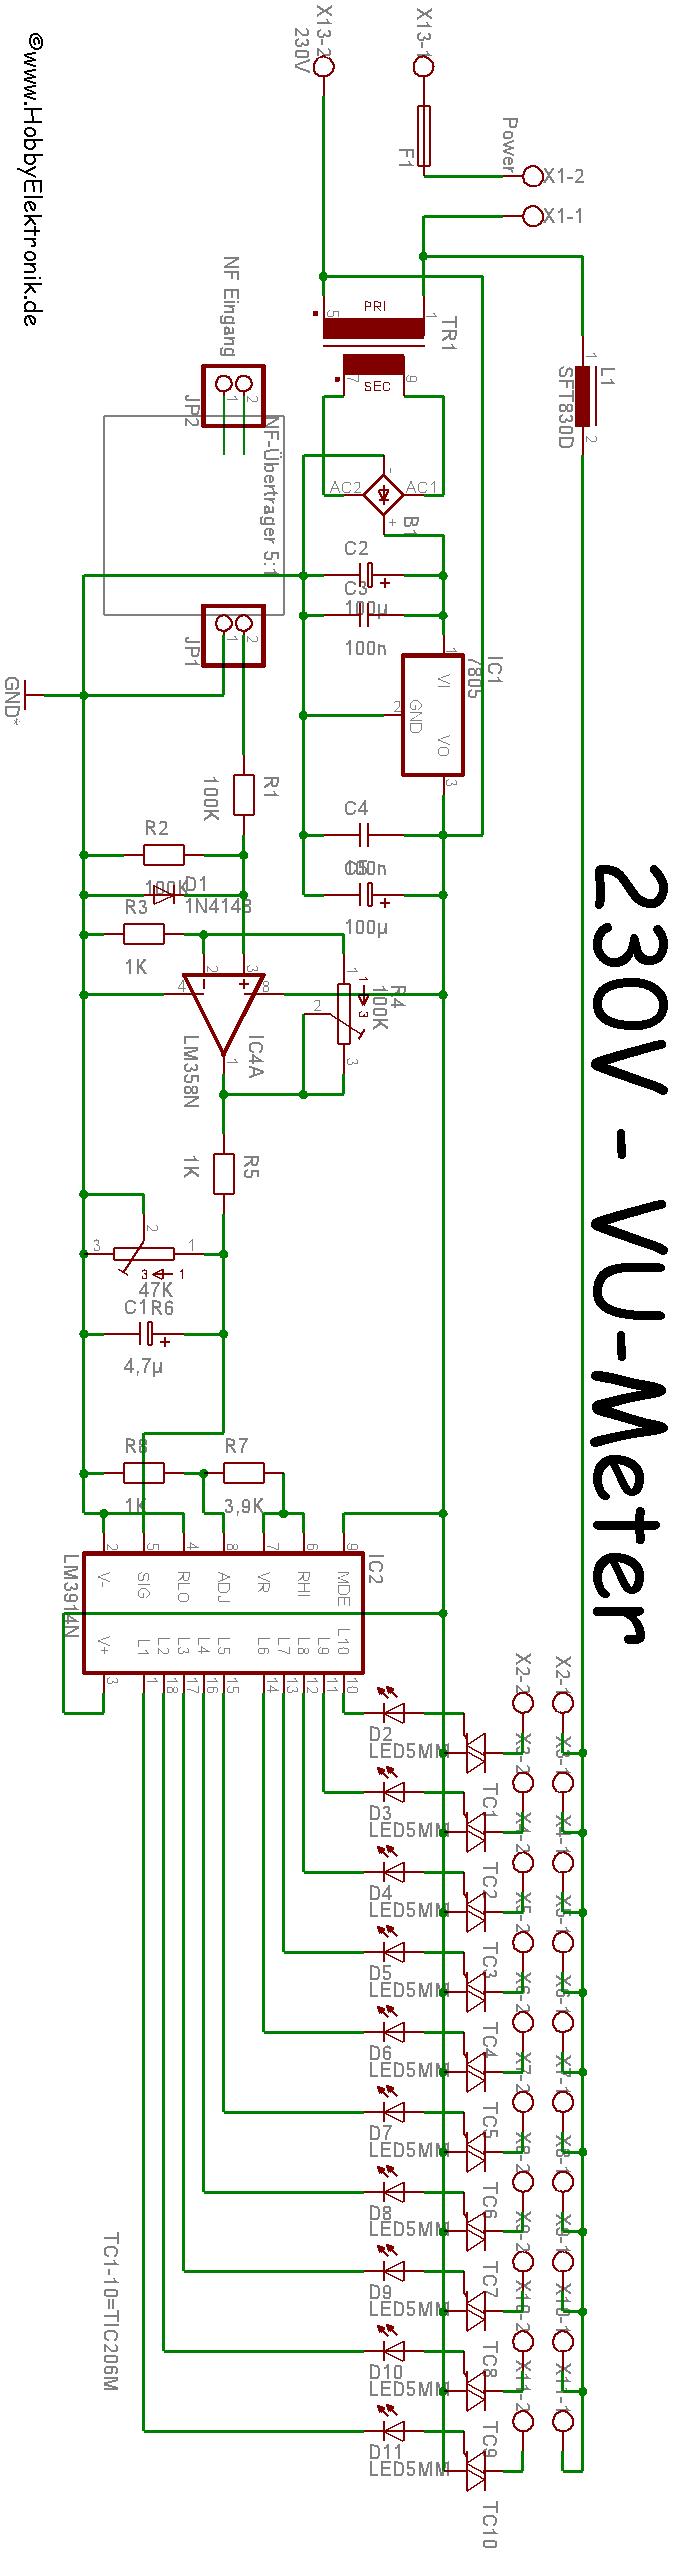 Lm3914 220v Light Vu Meter Circuit Electronics Projects Circuits Lm3915 Filter I 230v Vumetrethumbnail